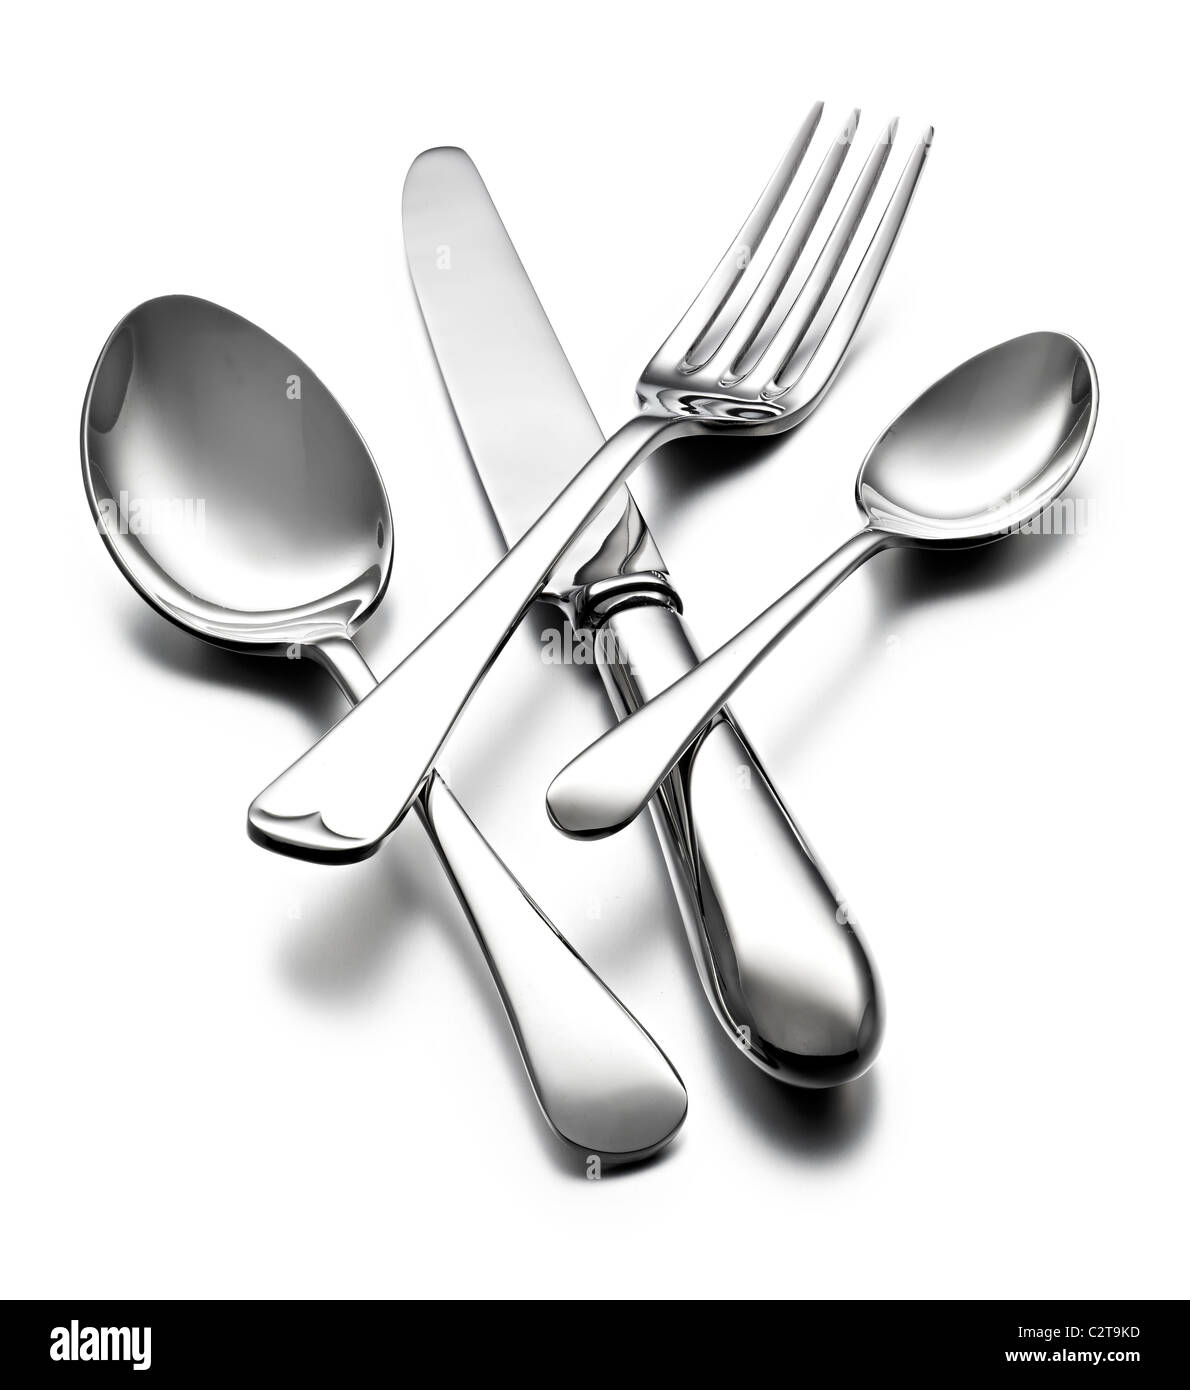 Shiny cutlery - Stock Image